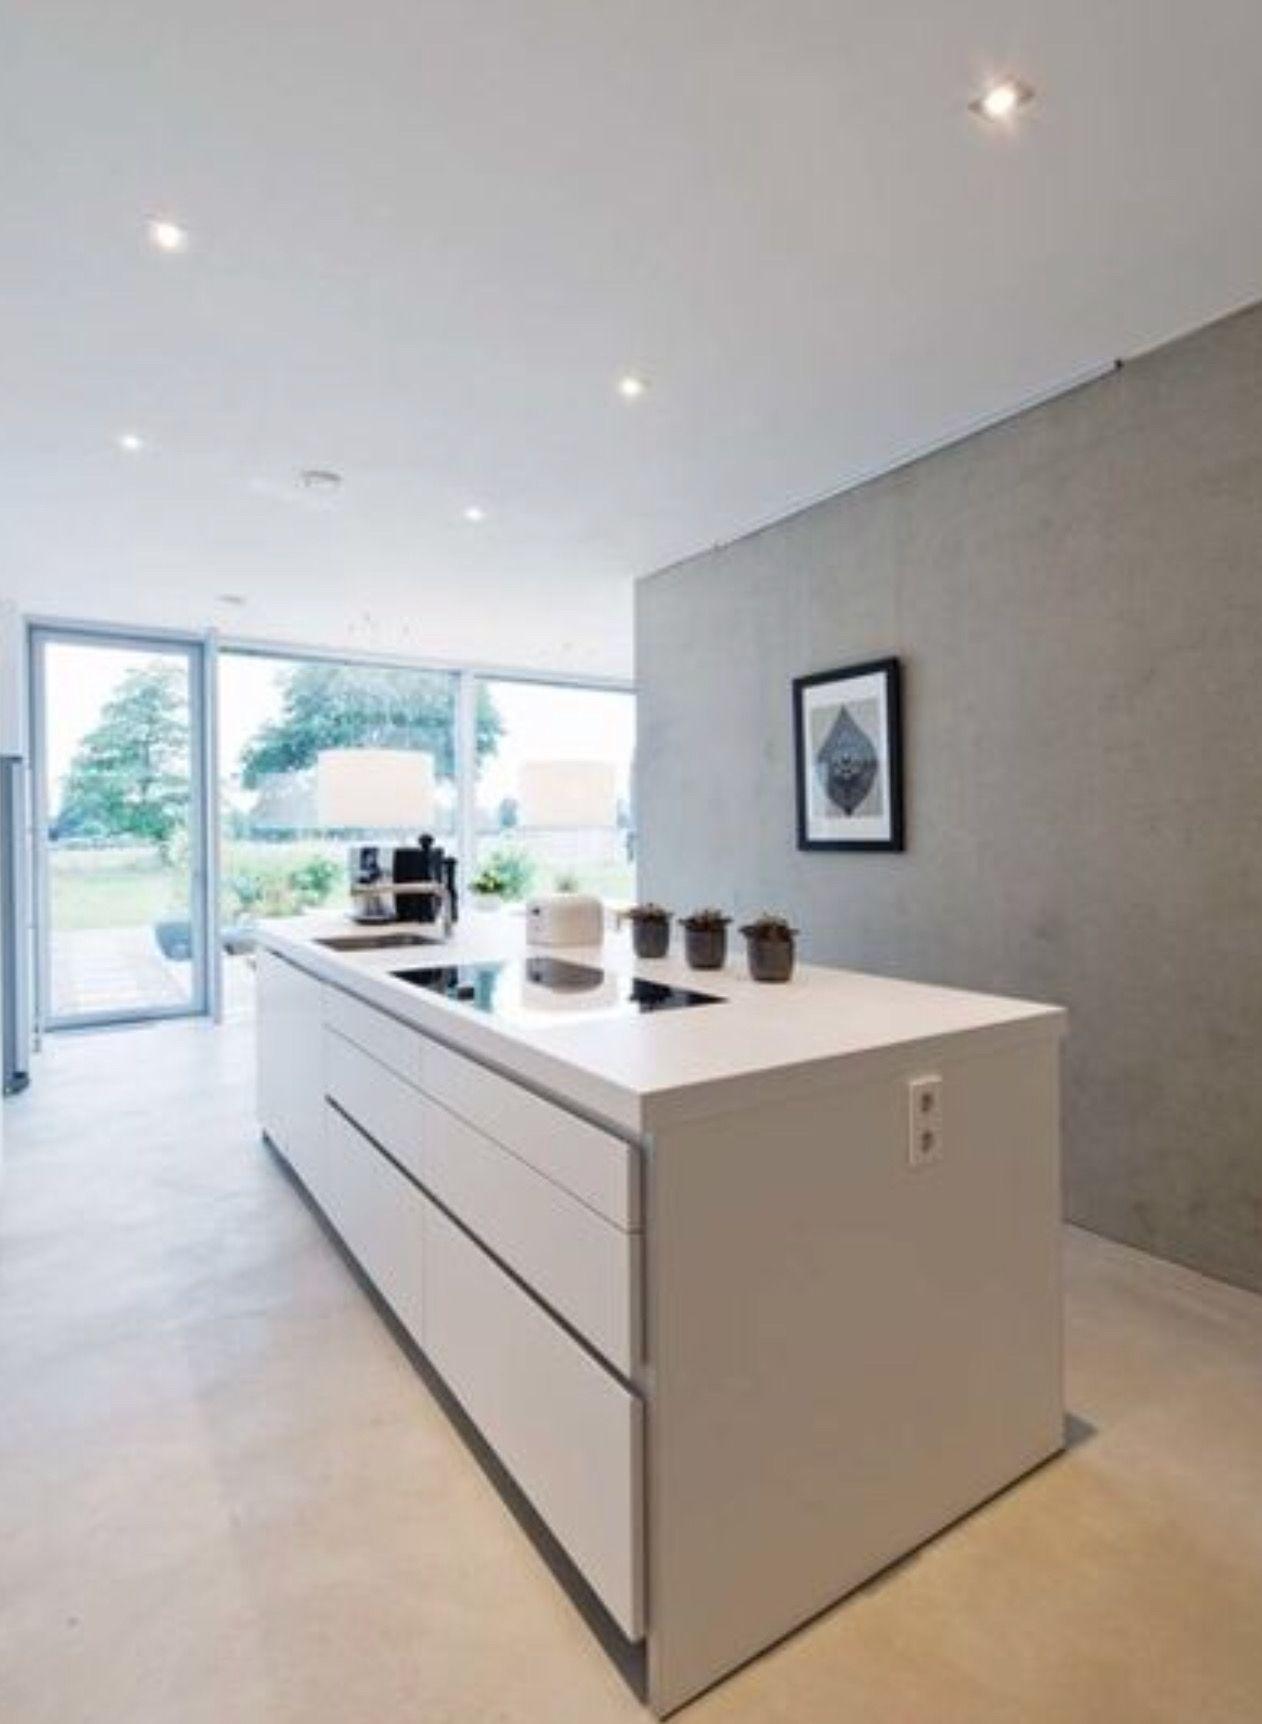 Downlights in kitchen cocinas modernas pinterest cocina moderna ikea y moderno - Downlight cocina ...